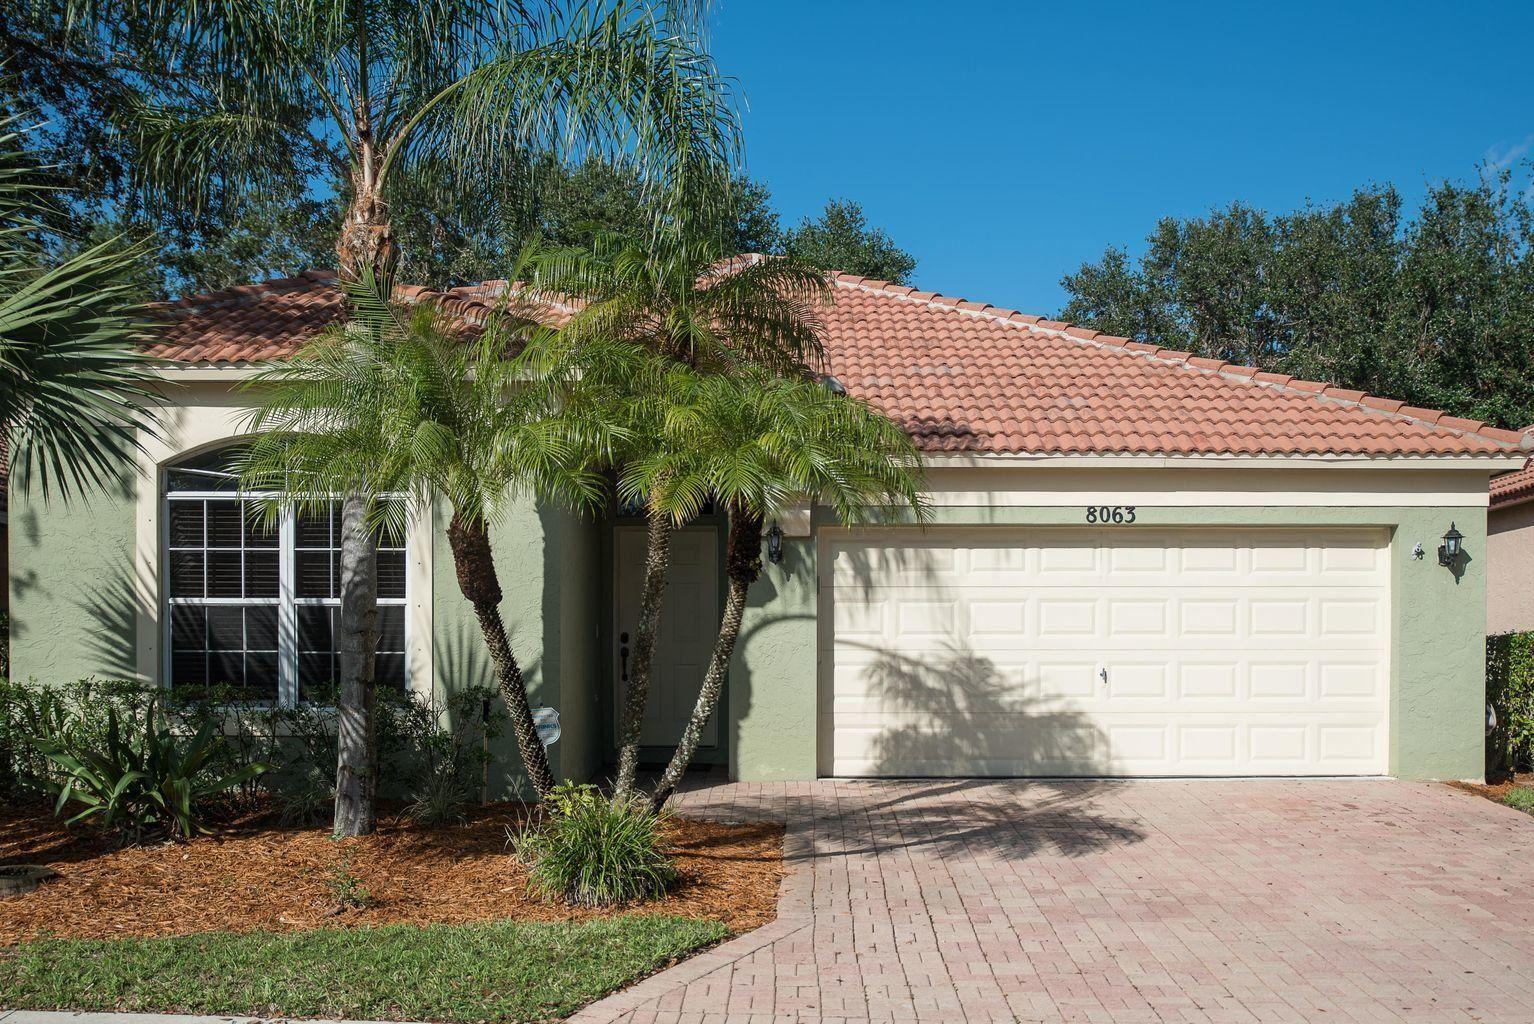 Photo of 8063 Via Hacienda, Riviera Beach, FL 33418 (MLS # RX-10730908)